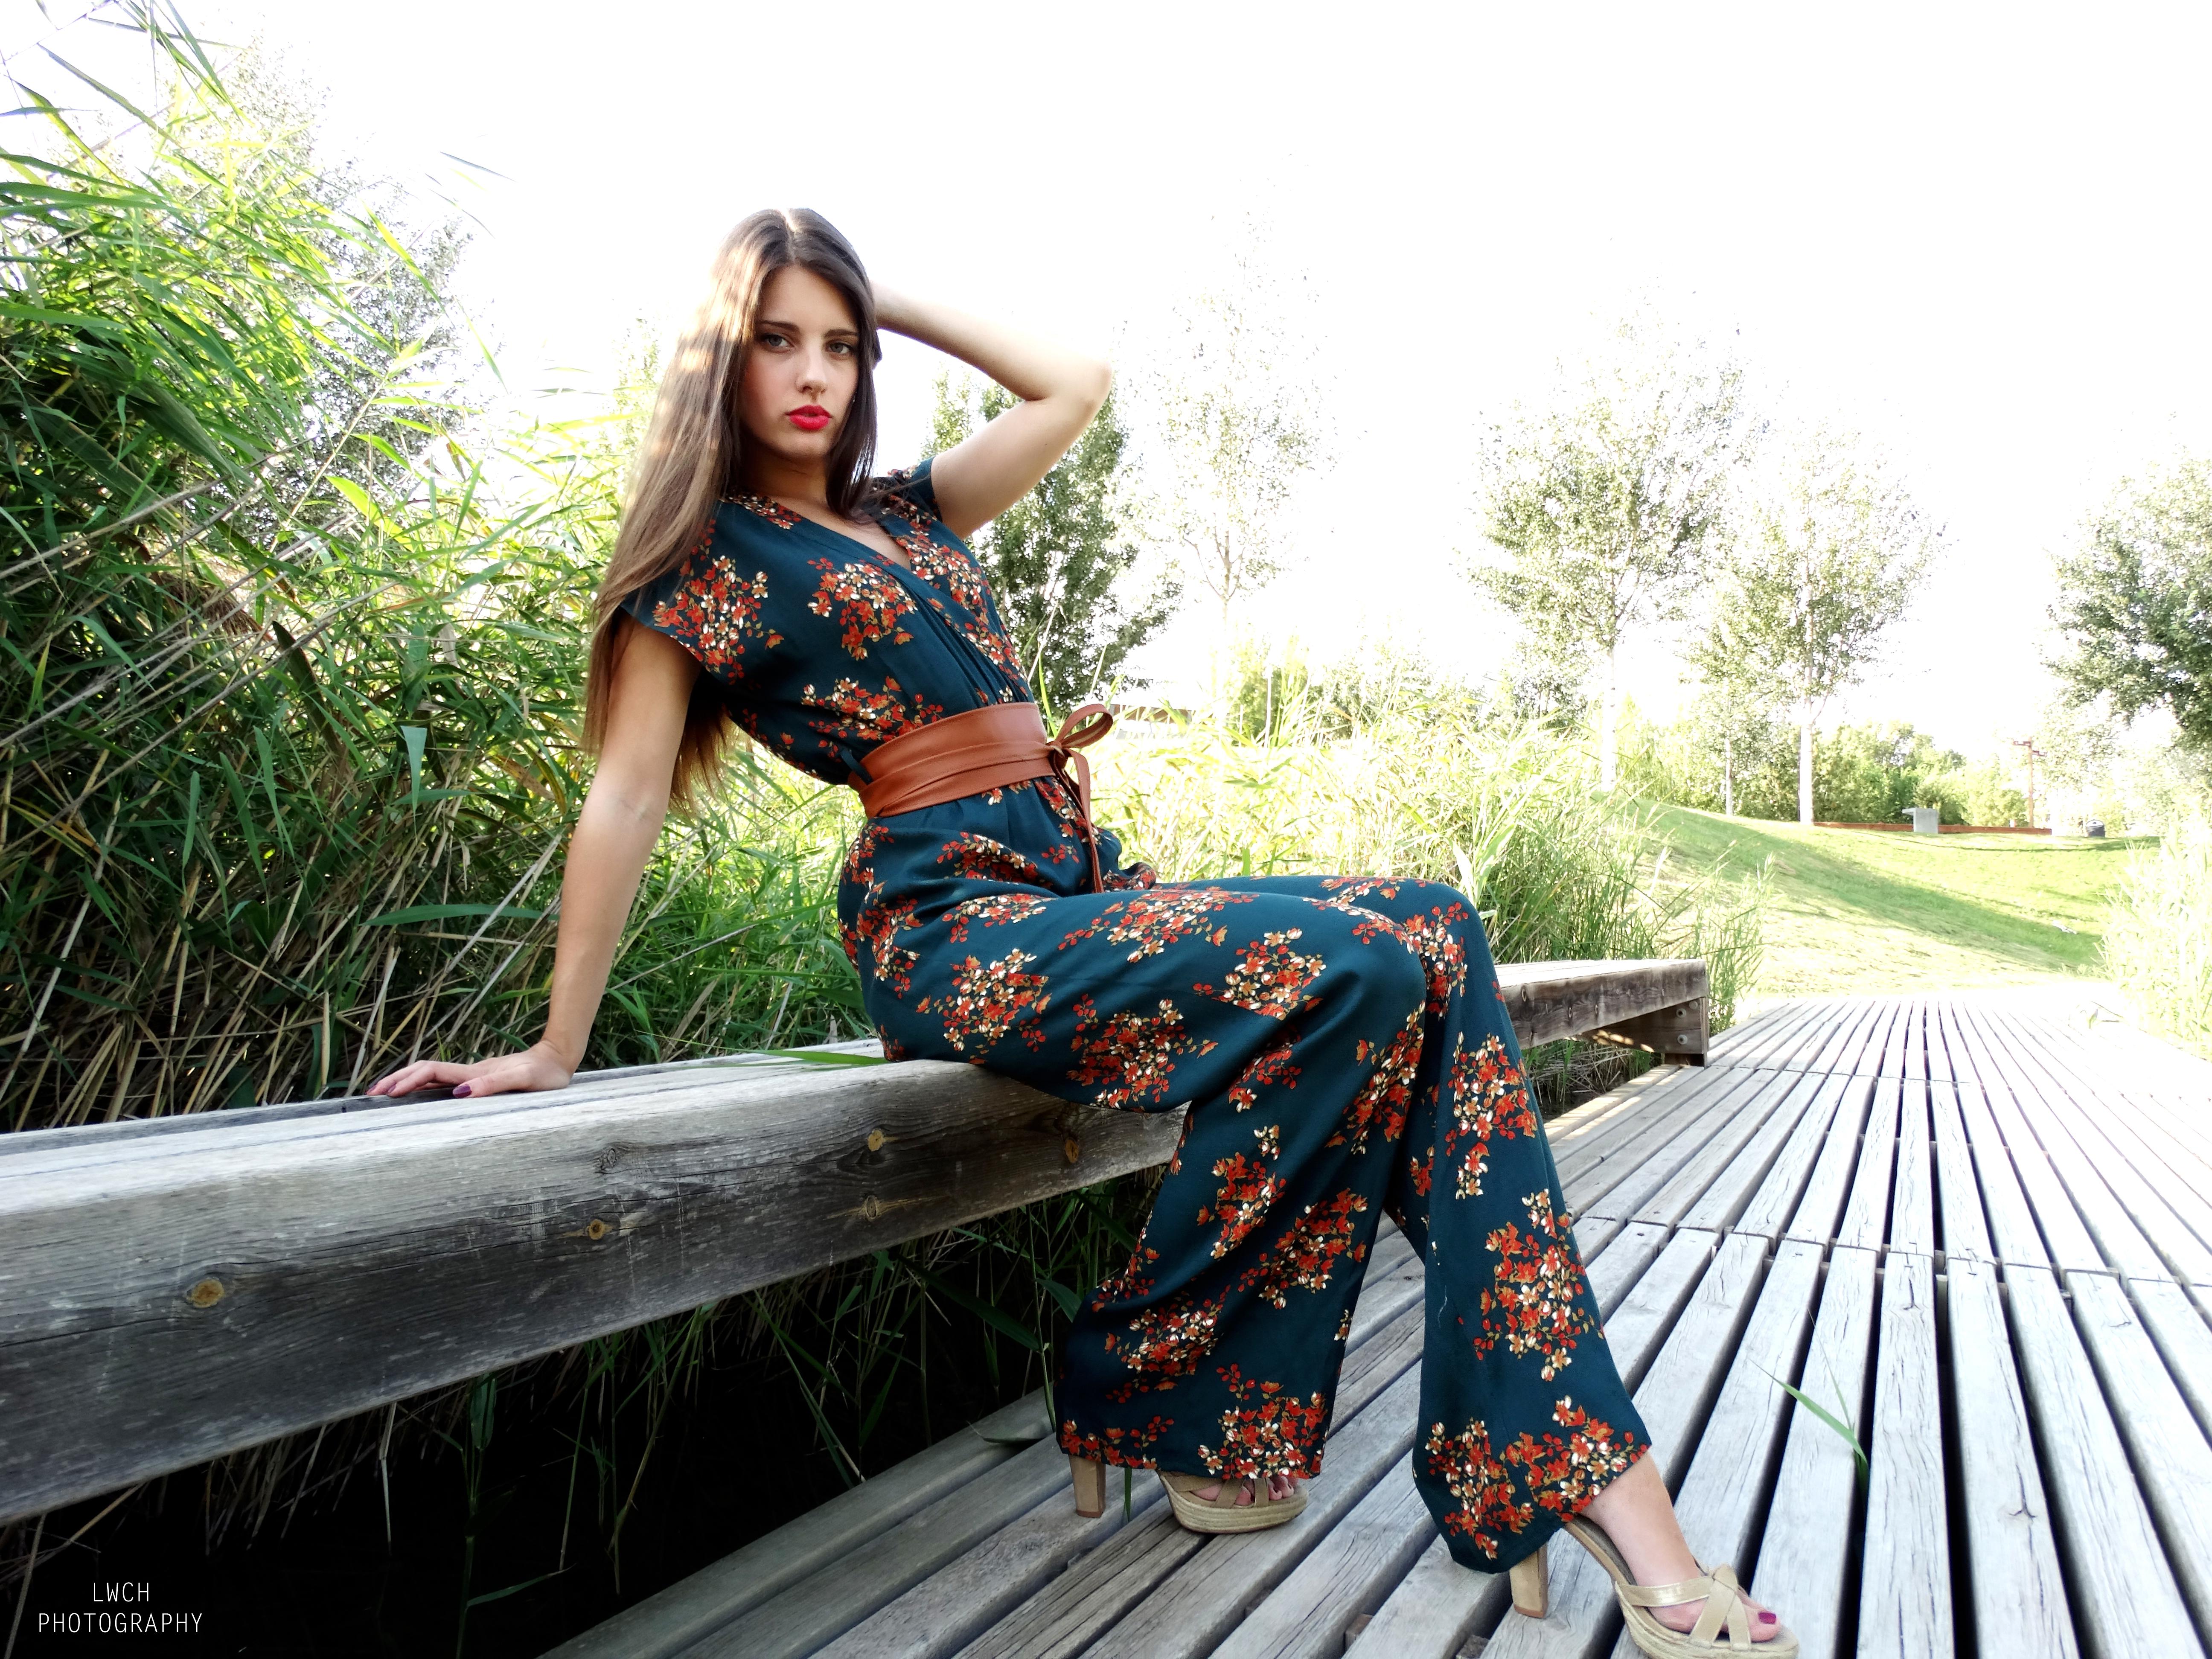 MODA_2015_LWHYPHOTO_AINHOA